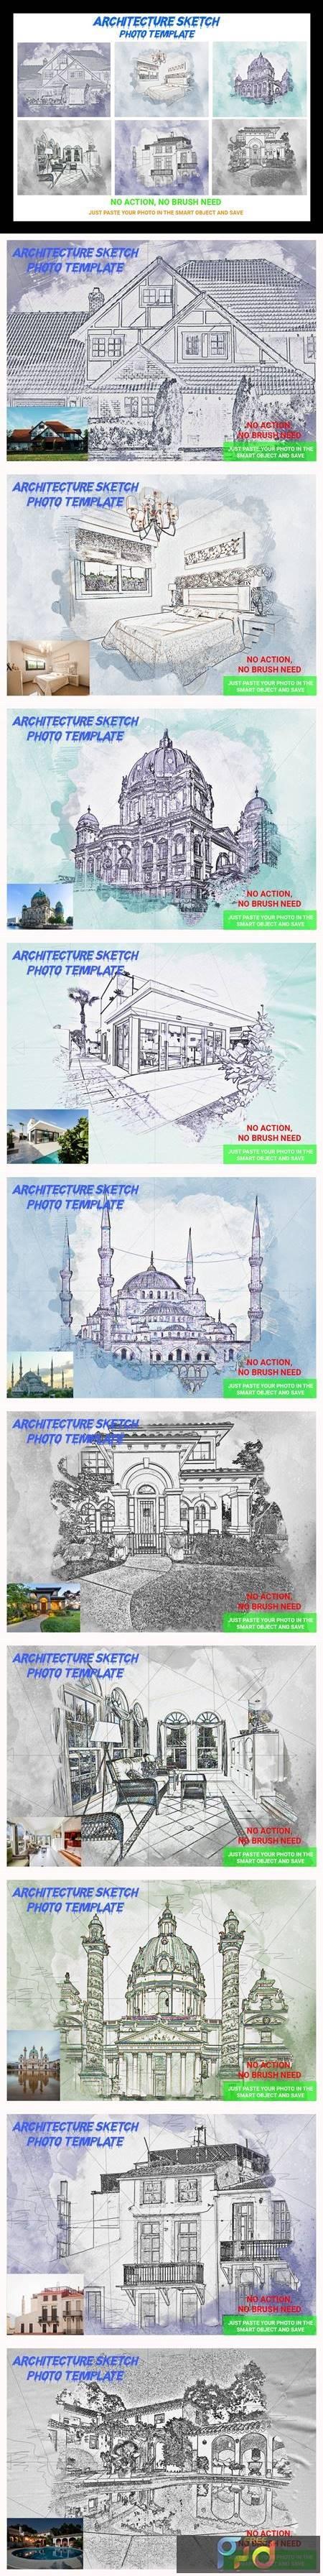 Architecture Sketch Photo Template 4545095 1